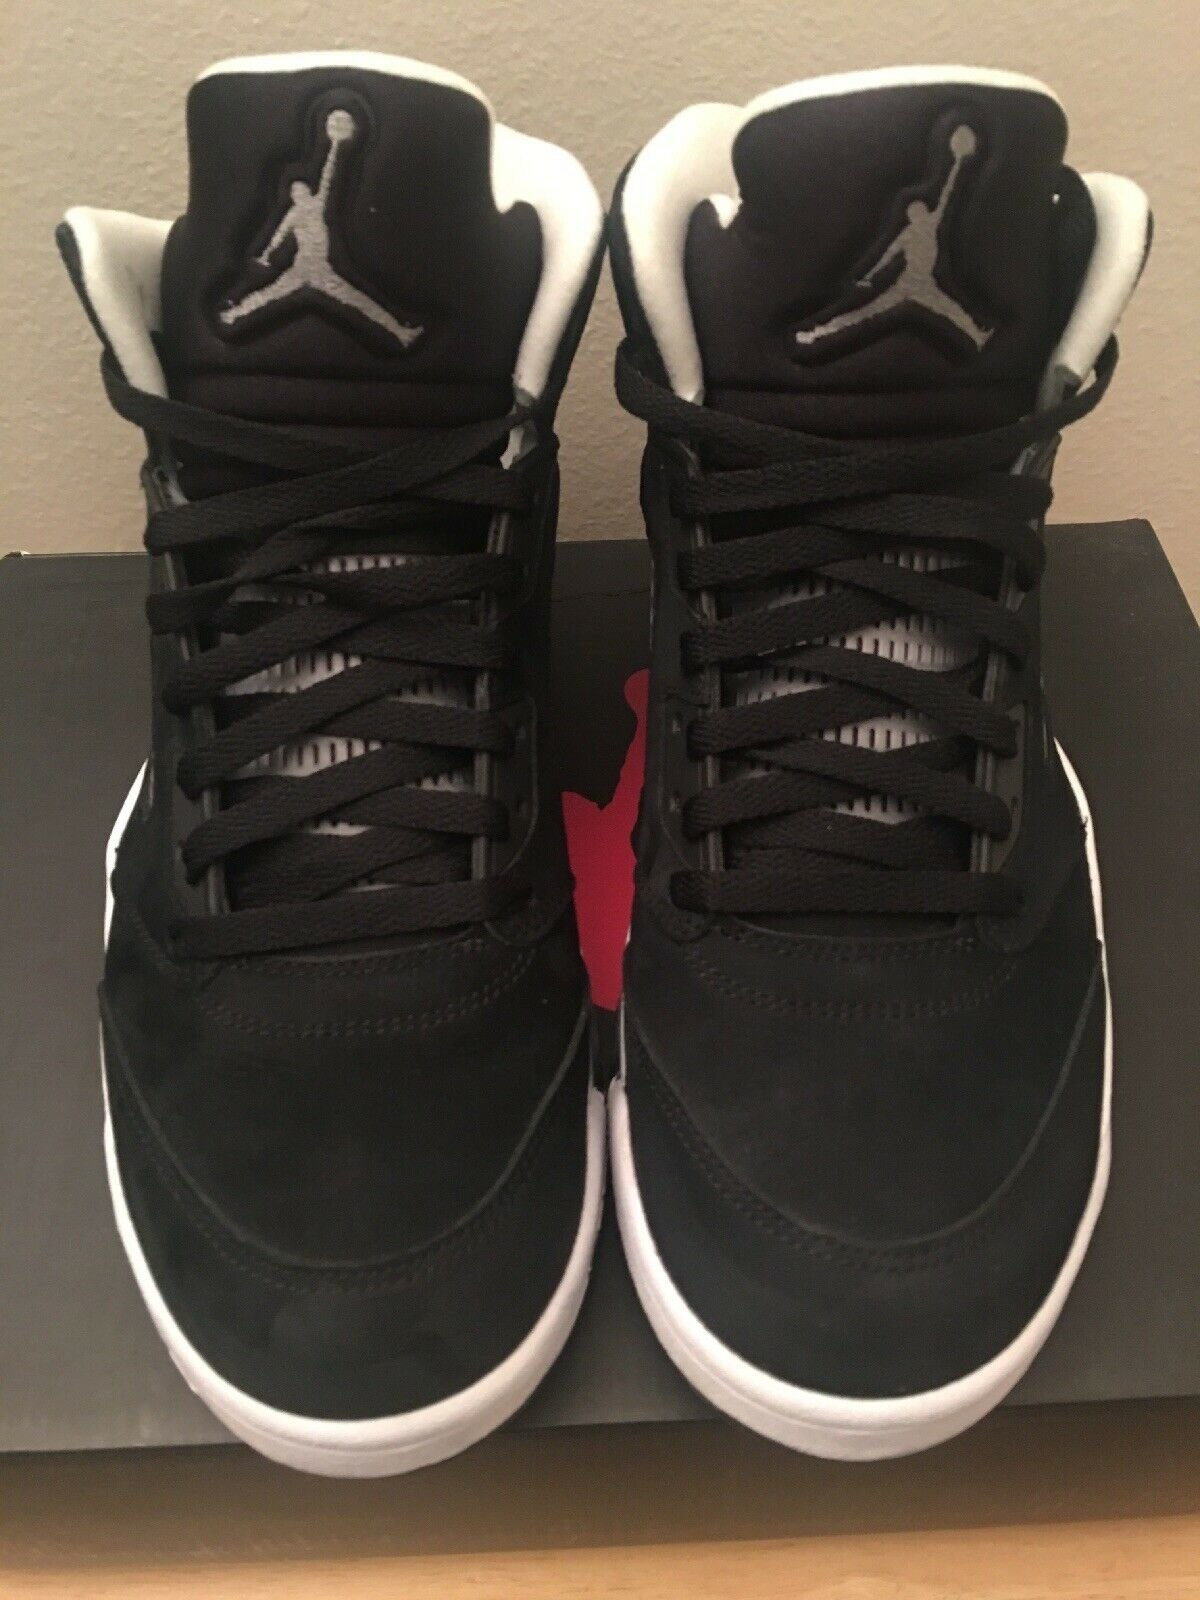 Nike Air Jordan V 5 Retro Oreo Black White Cool Grey (136027 035) Size 11 Minty